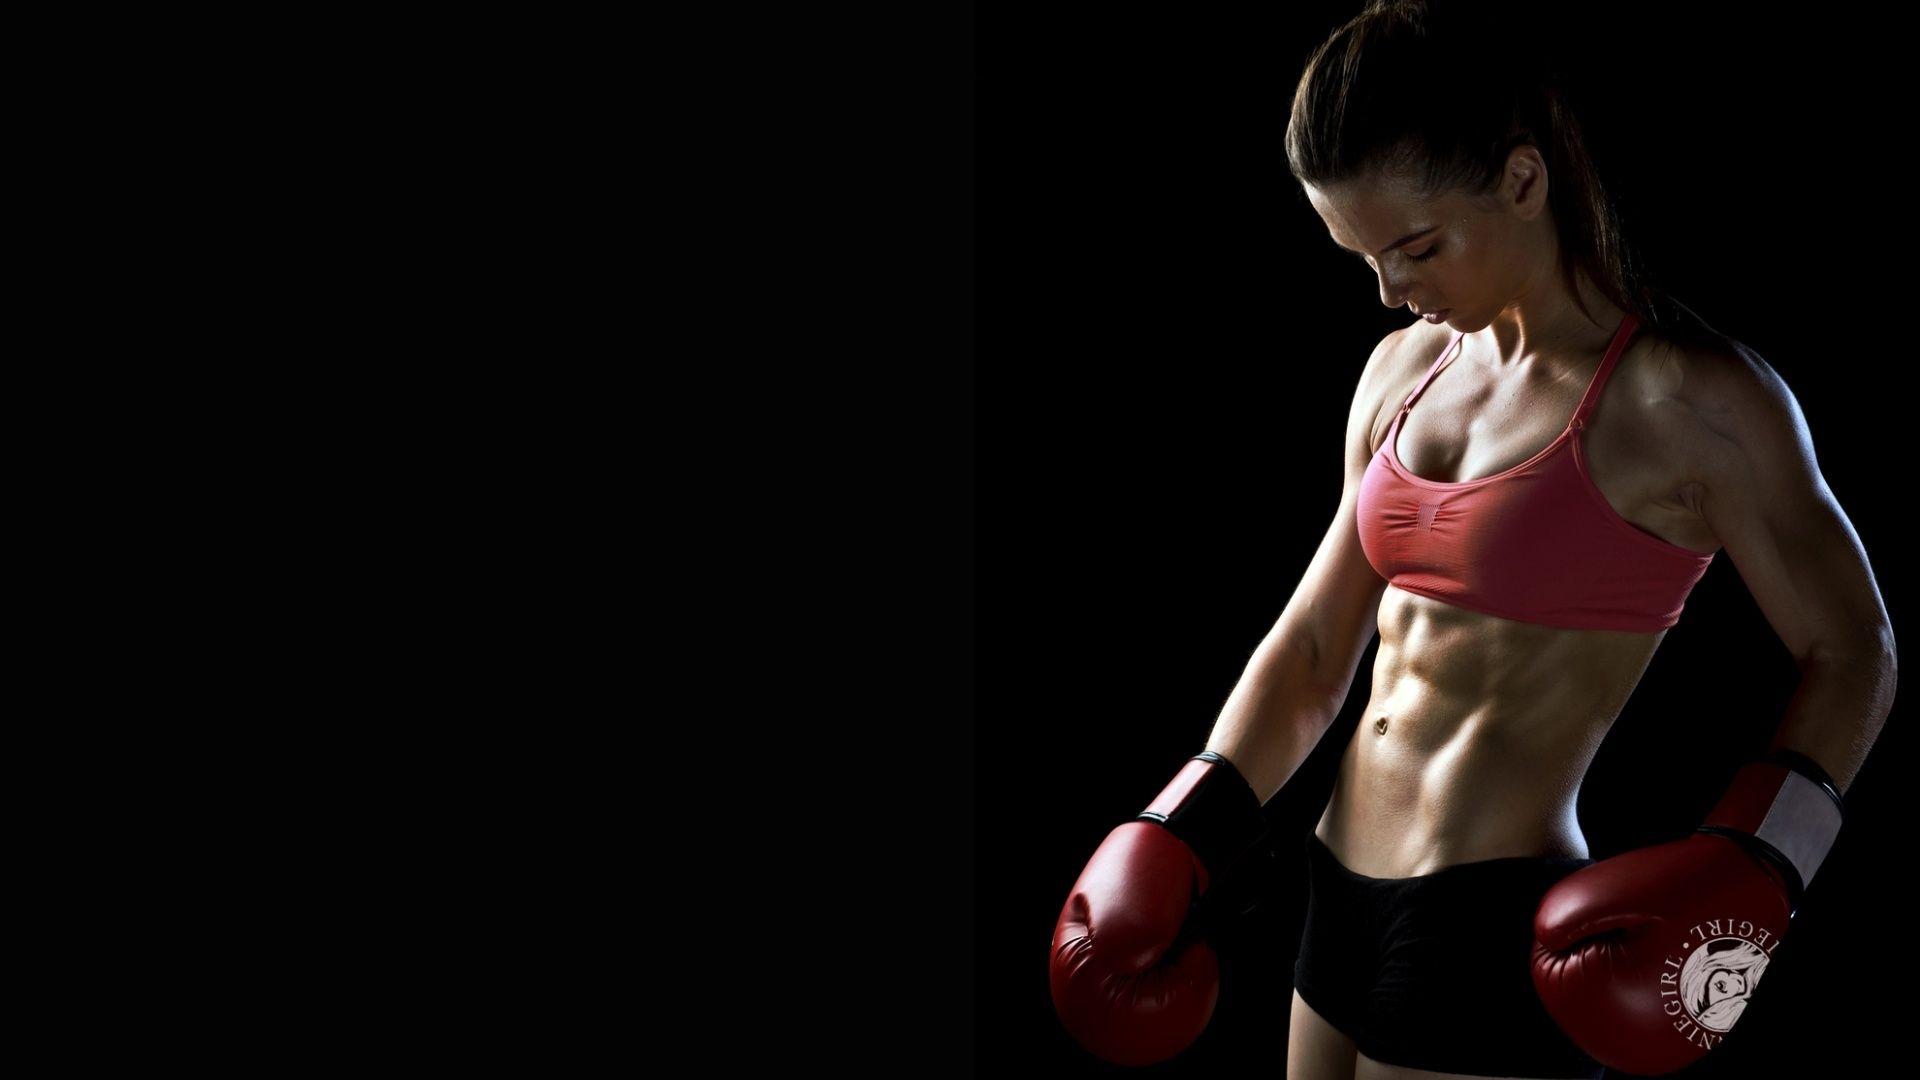 Boxing 1080p Wallpaper